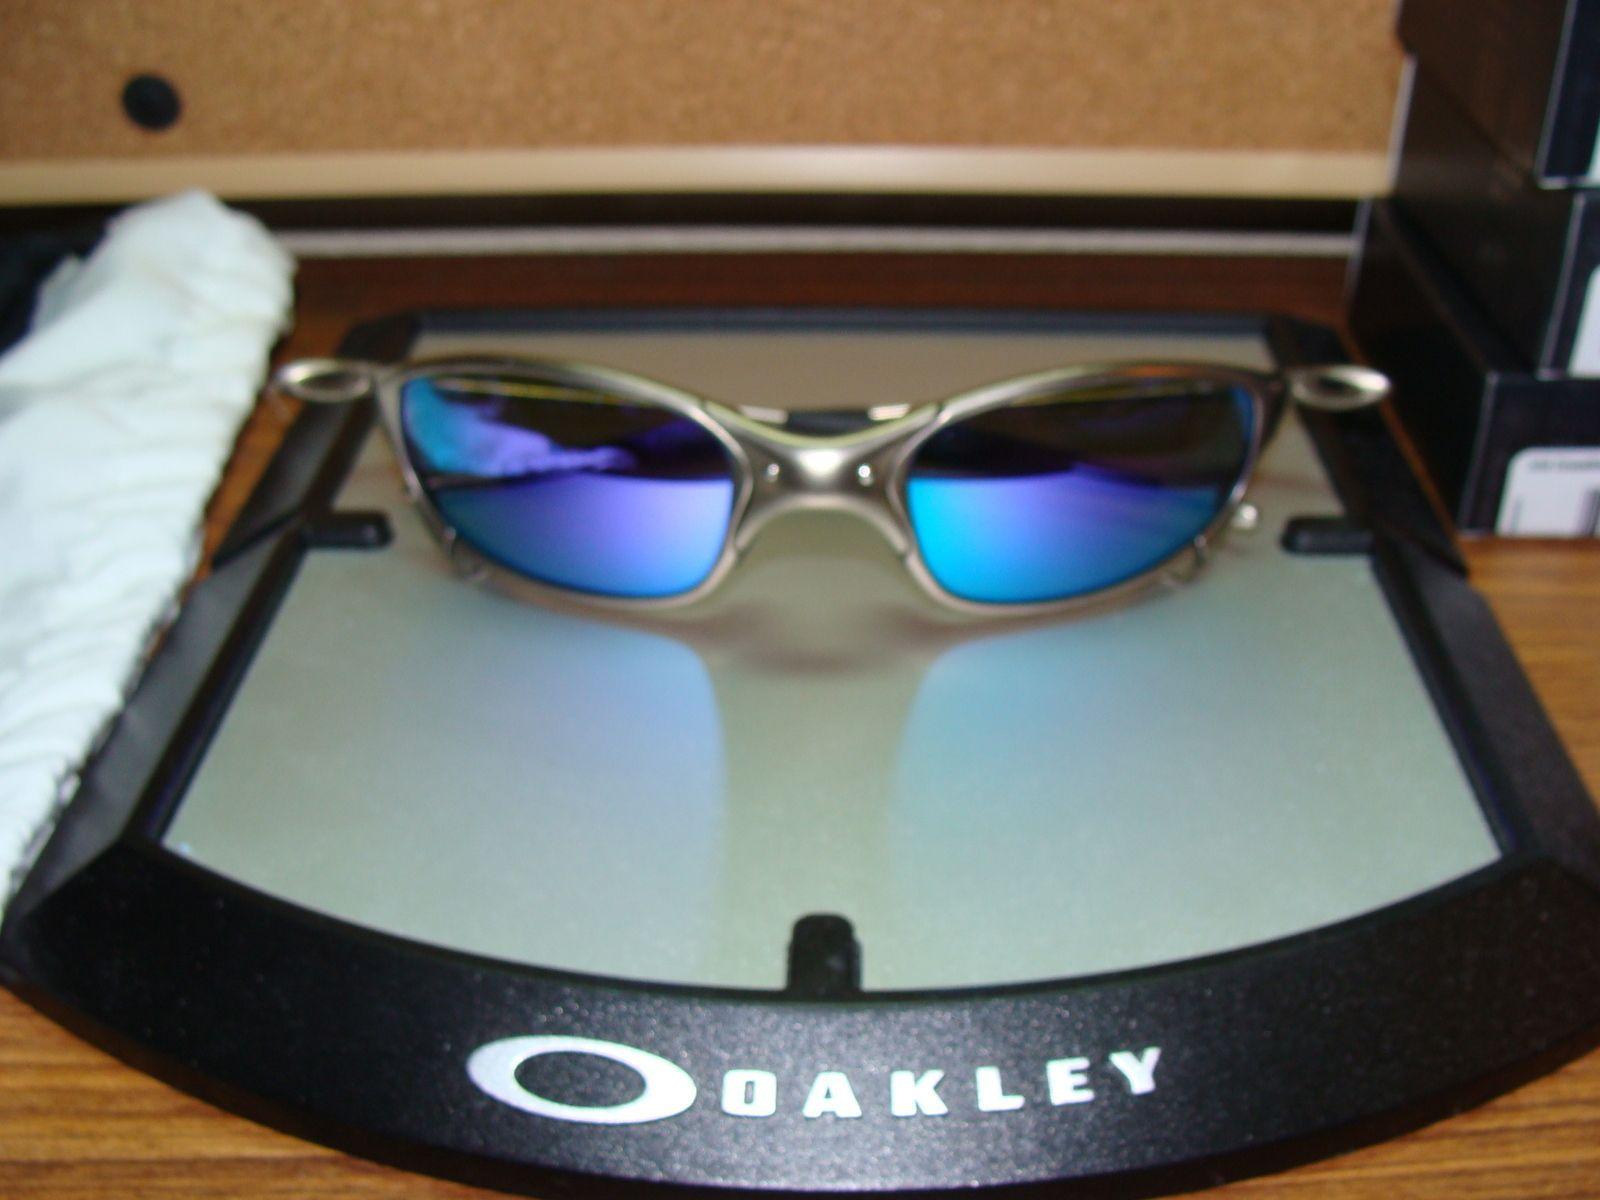 $85 Custom Cut Violet Iridium Lenses For Juliet - dsc03577zy.jpg